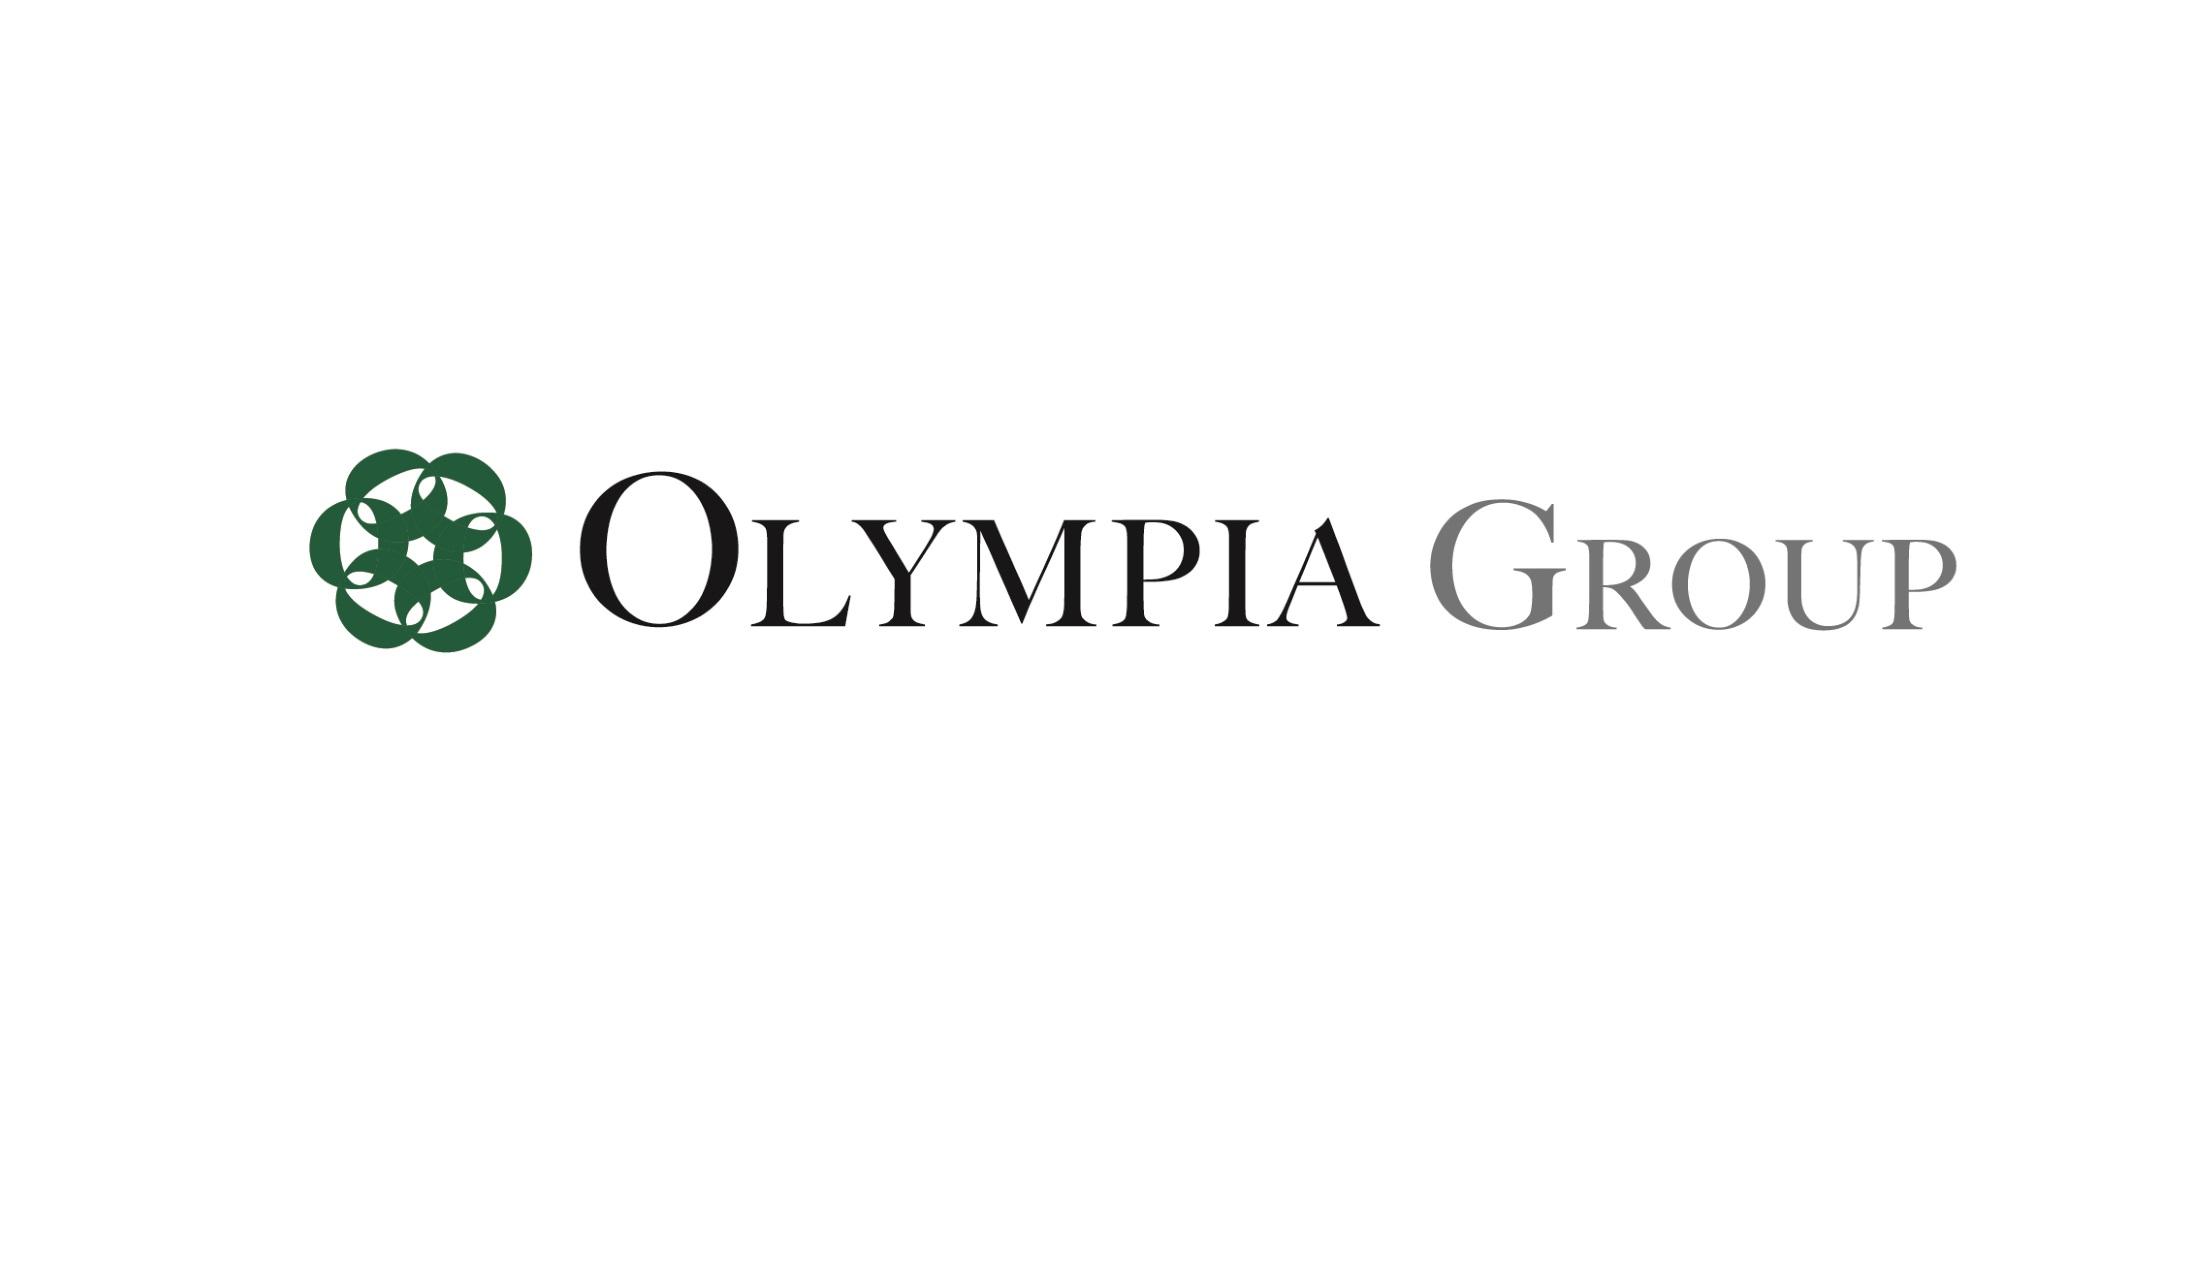 Olympia: Νέα εποχή εταιρικής διακυβέρνησης!